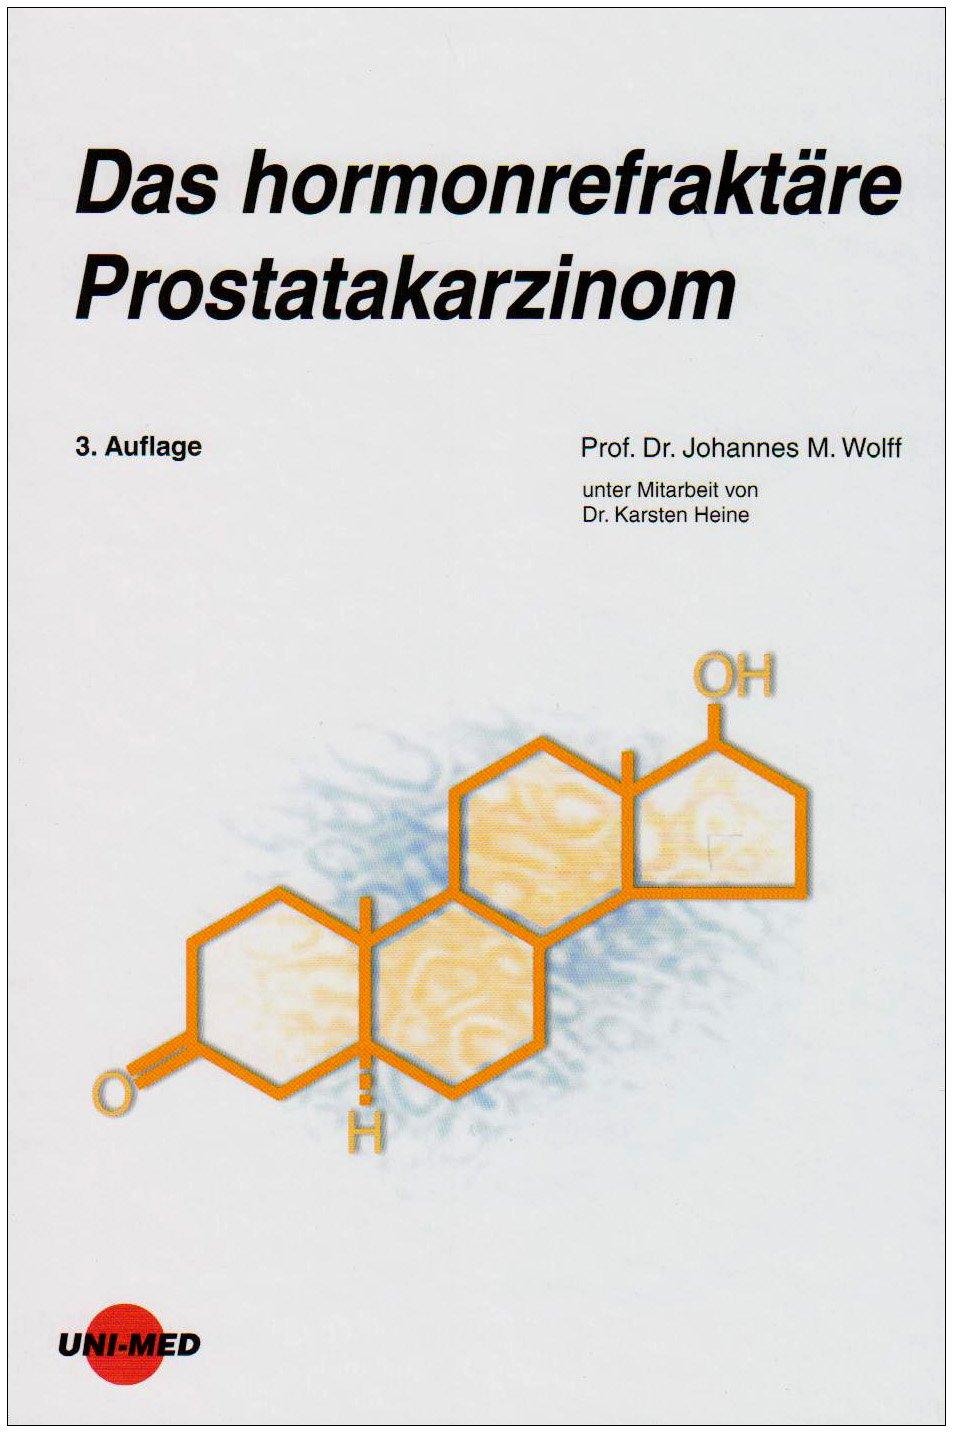 Das hormonrefraktäre Prostatakarzinom